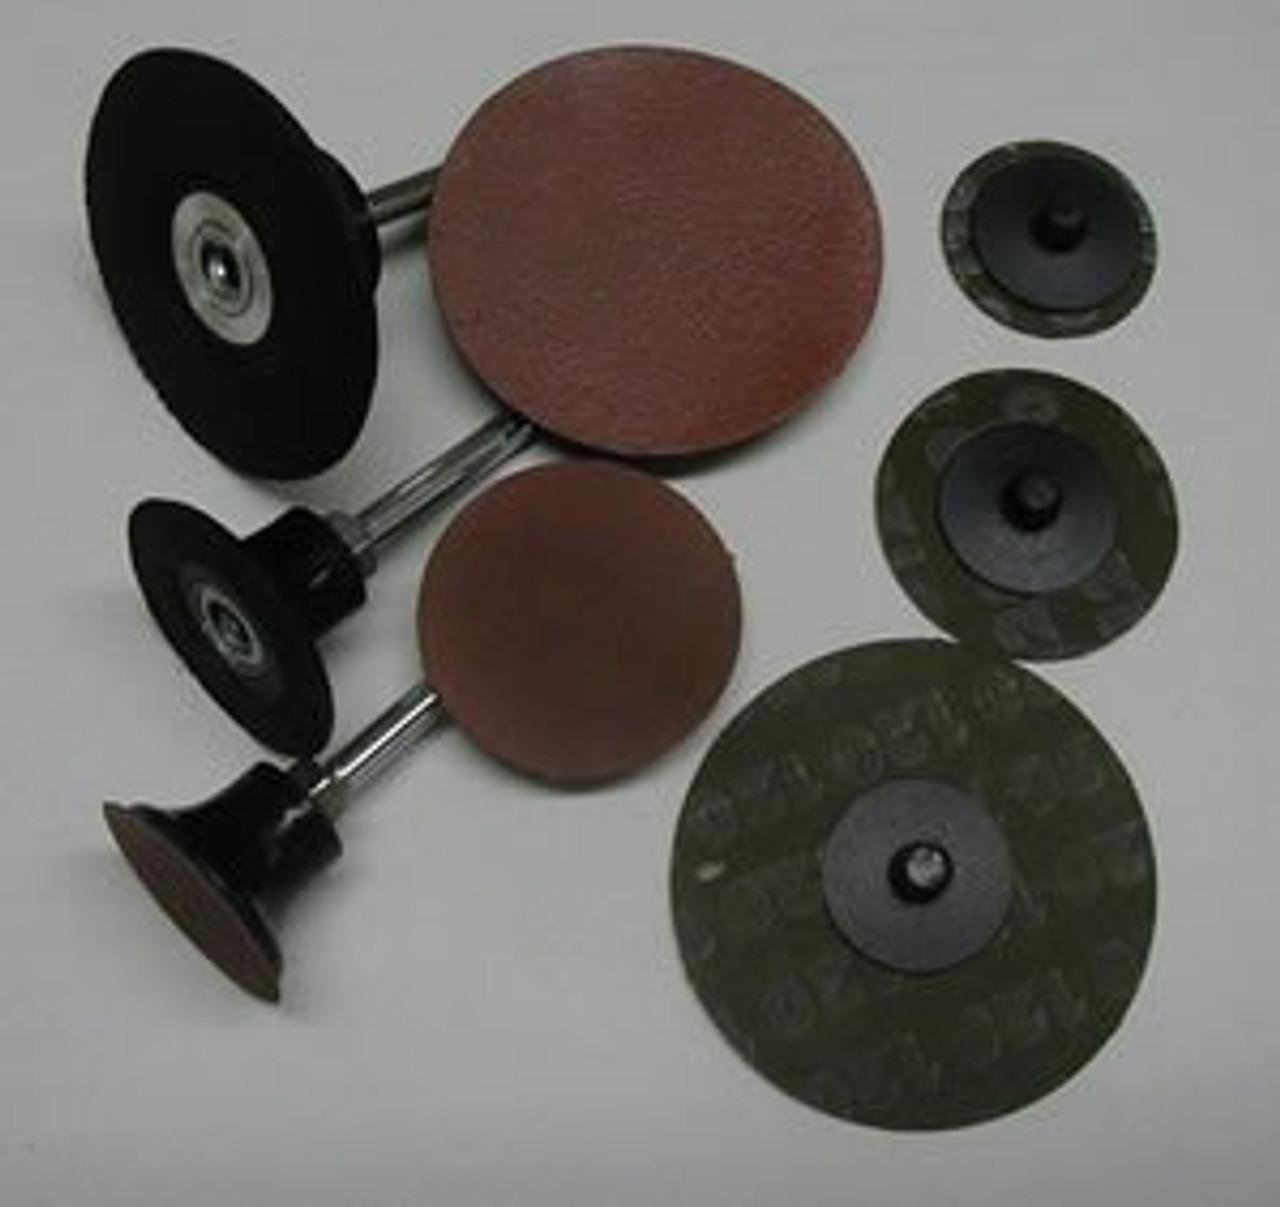 "Aluminum Oxide Sanding Disk 2"" - 100 Grit"